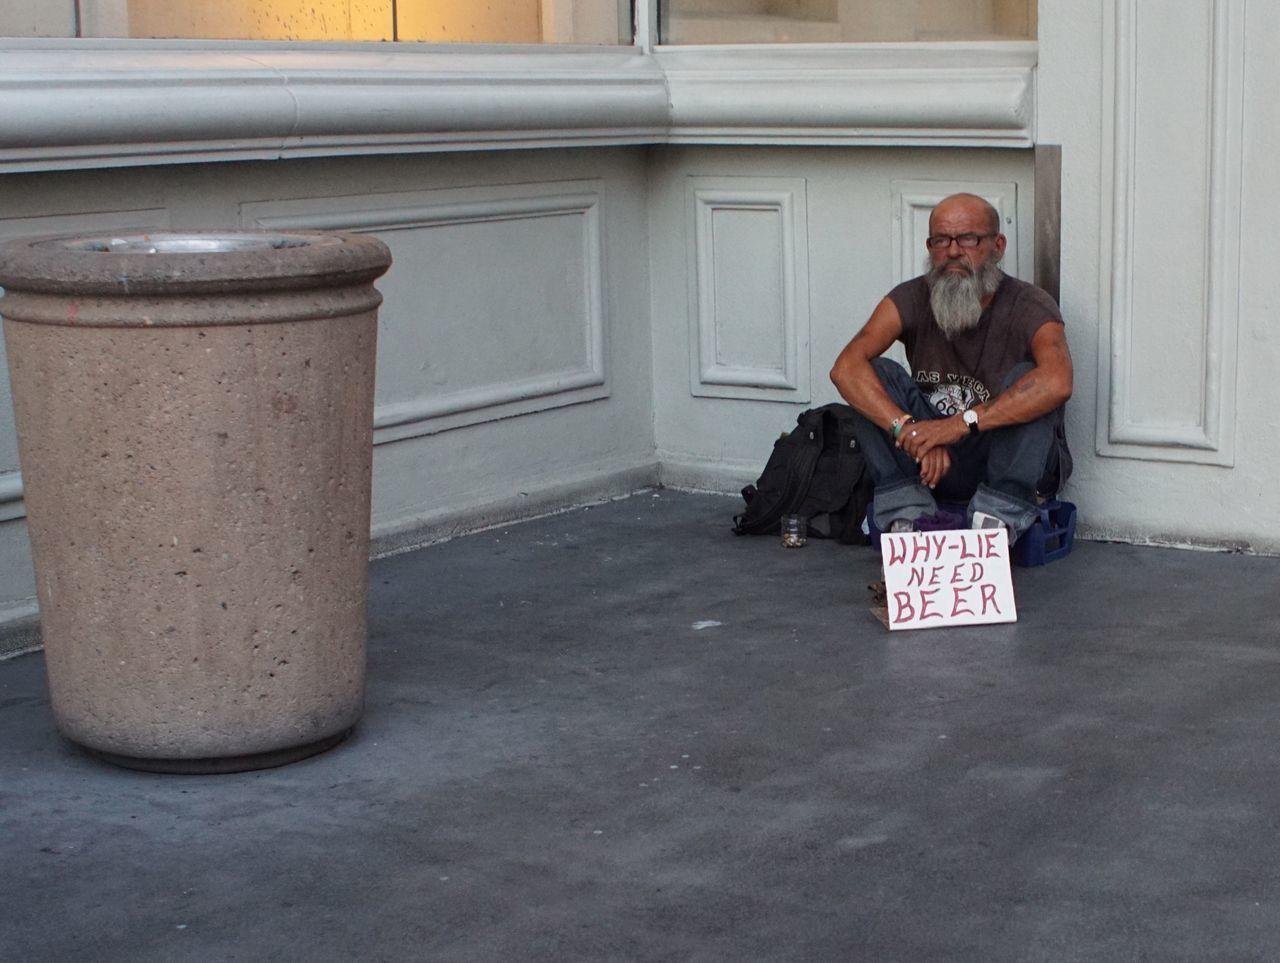 Pixxzo Streetphotography Las Vegas Sony A6000 Sigma Drunk Beer Homeless